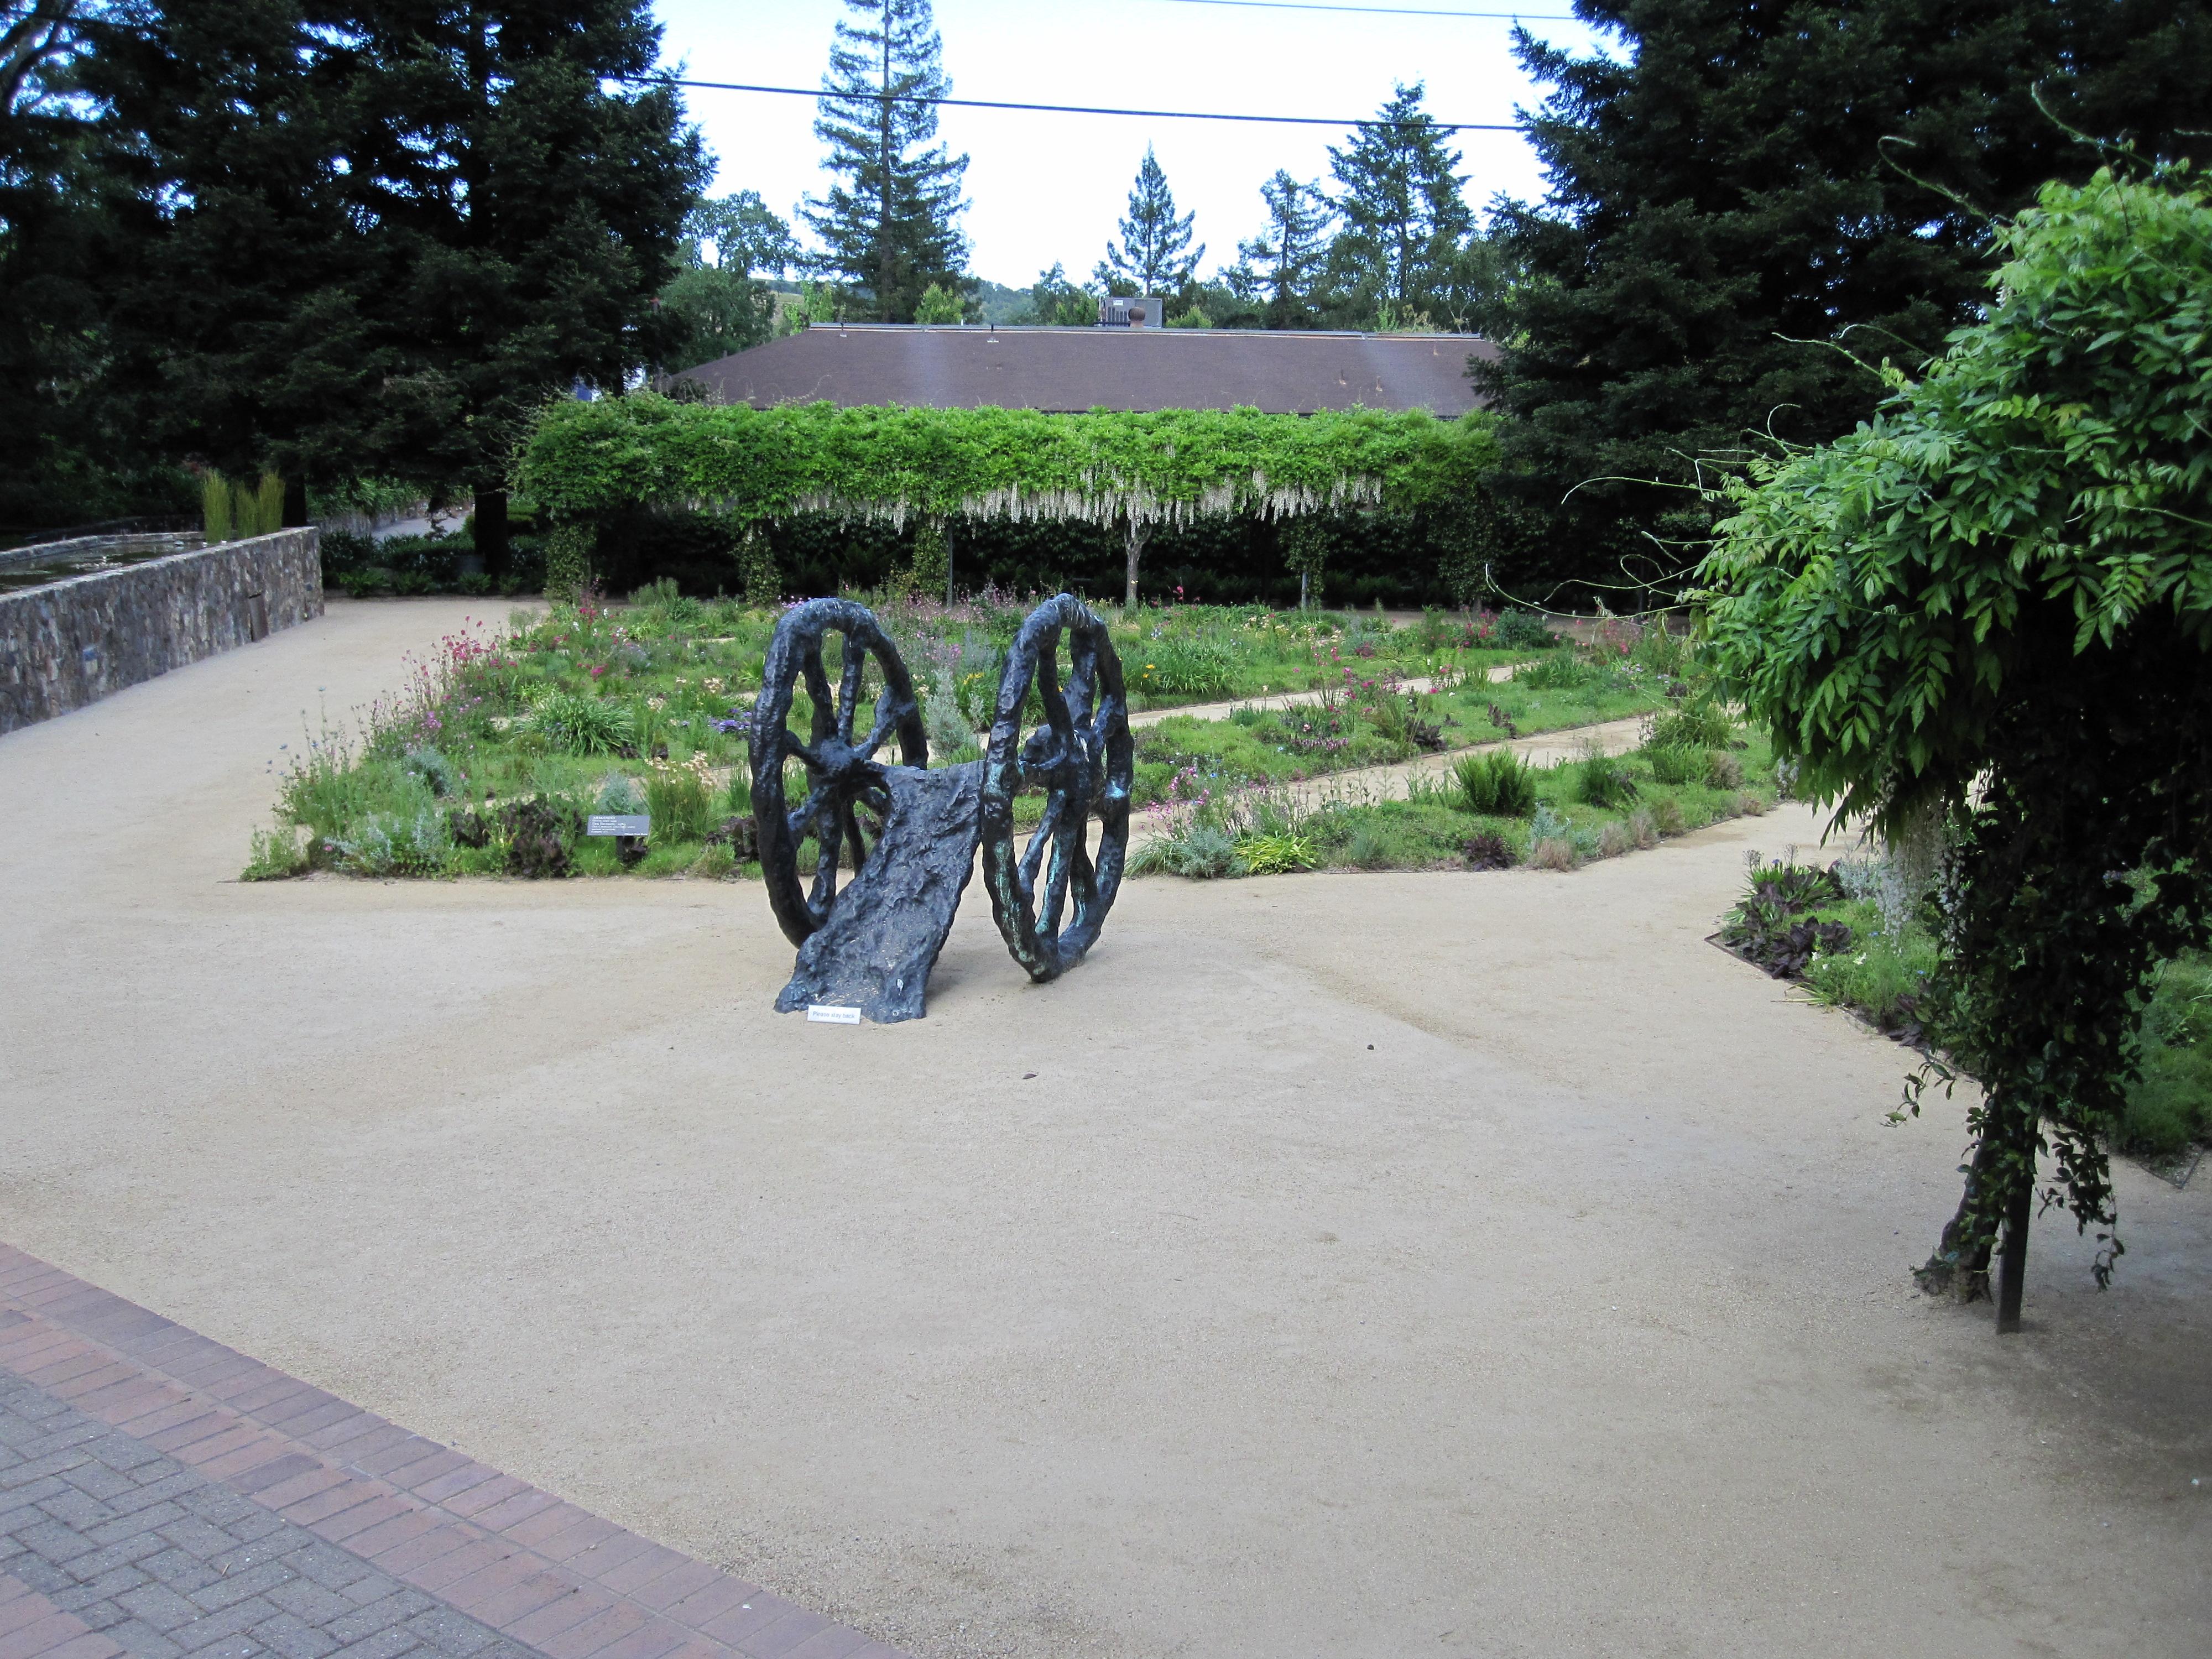 Hess Winery garden